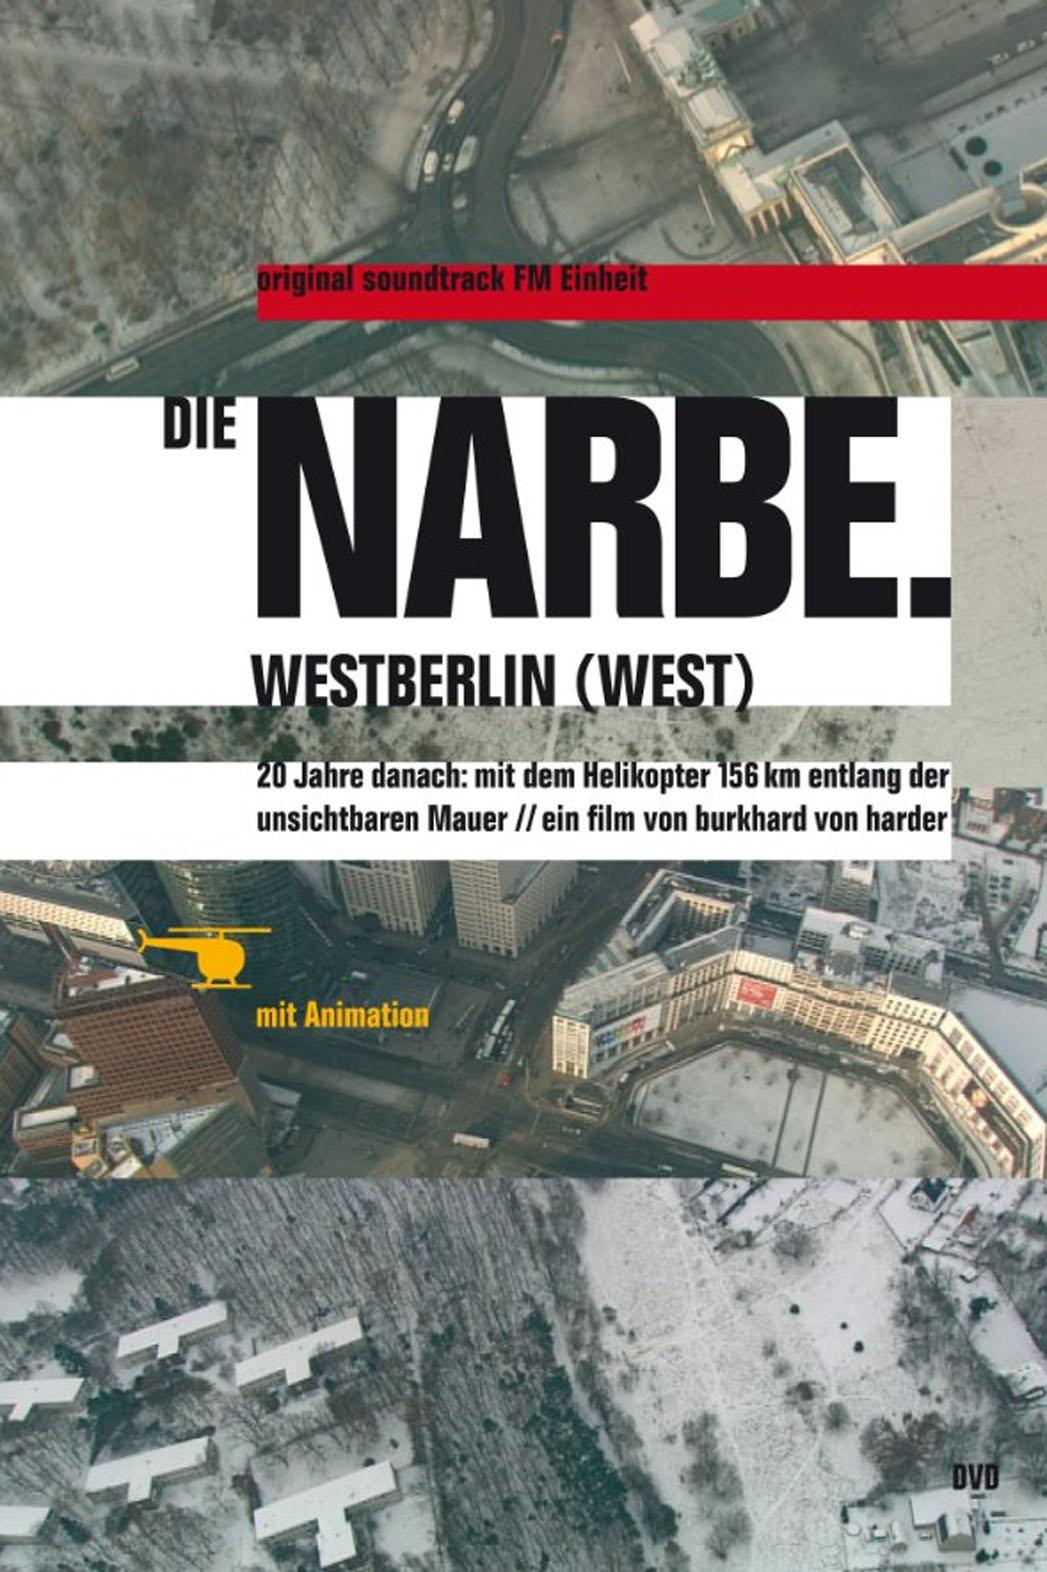 Die Narbe. Westberlin Poster - P 2013